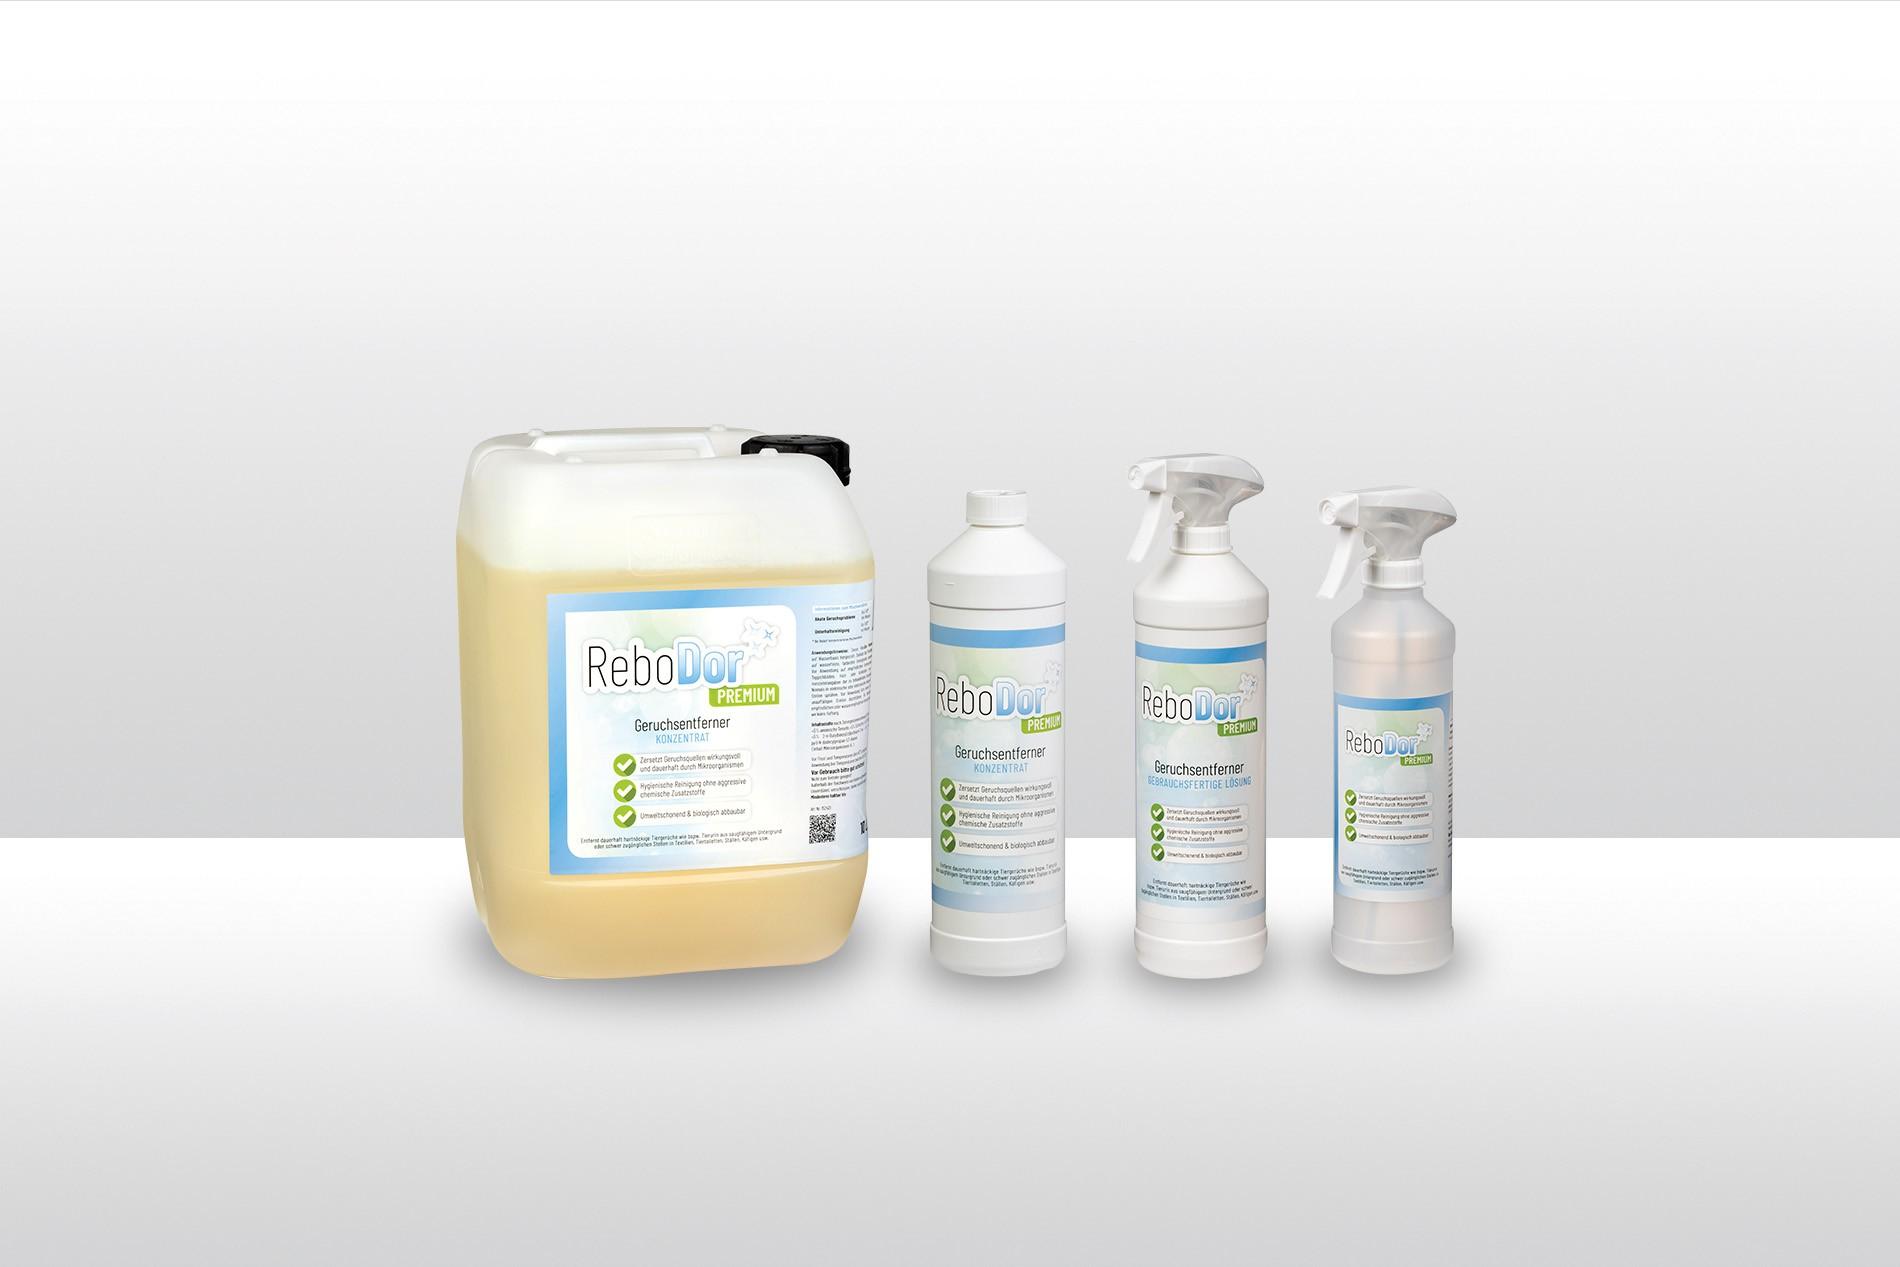 ReboDor Premium Geruchsentferner